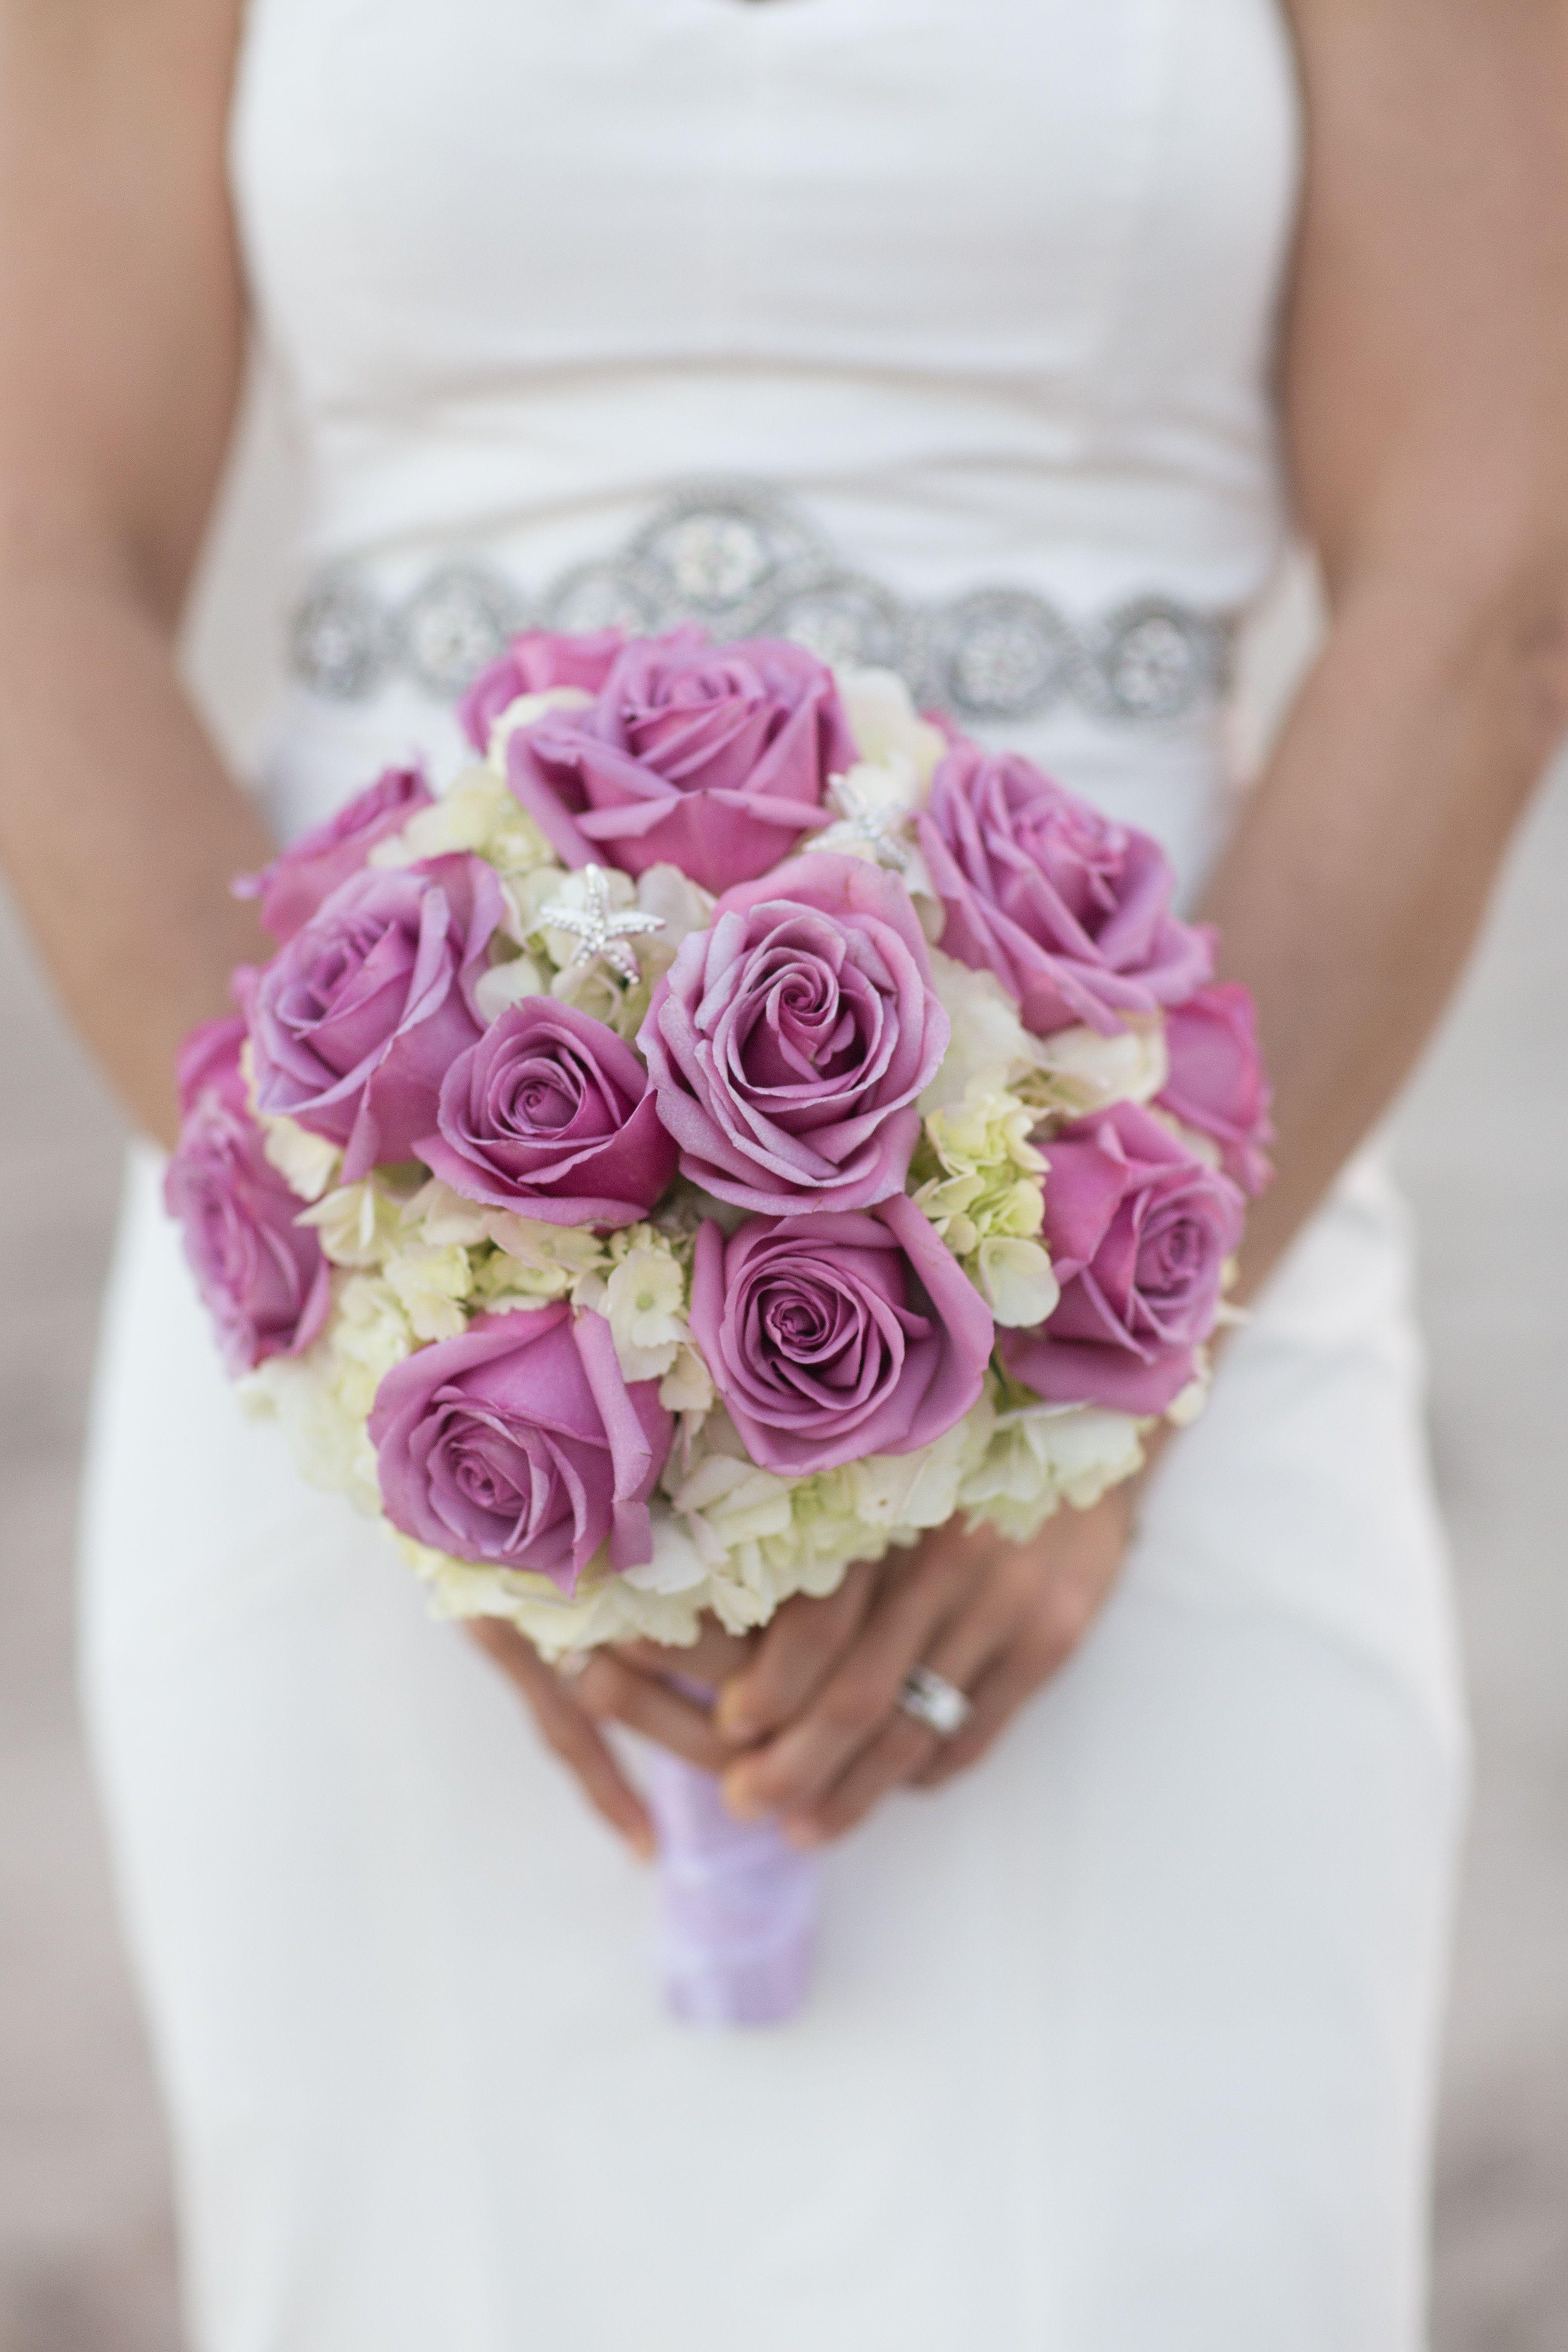 Pin By Pamela Provagna On Wedding Flowers - Pinterest -